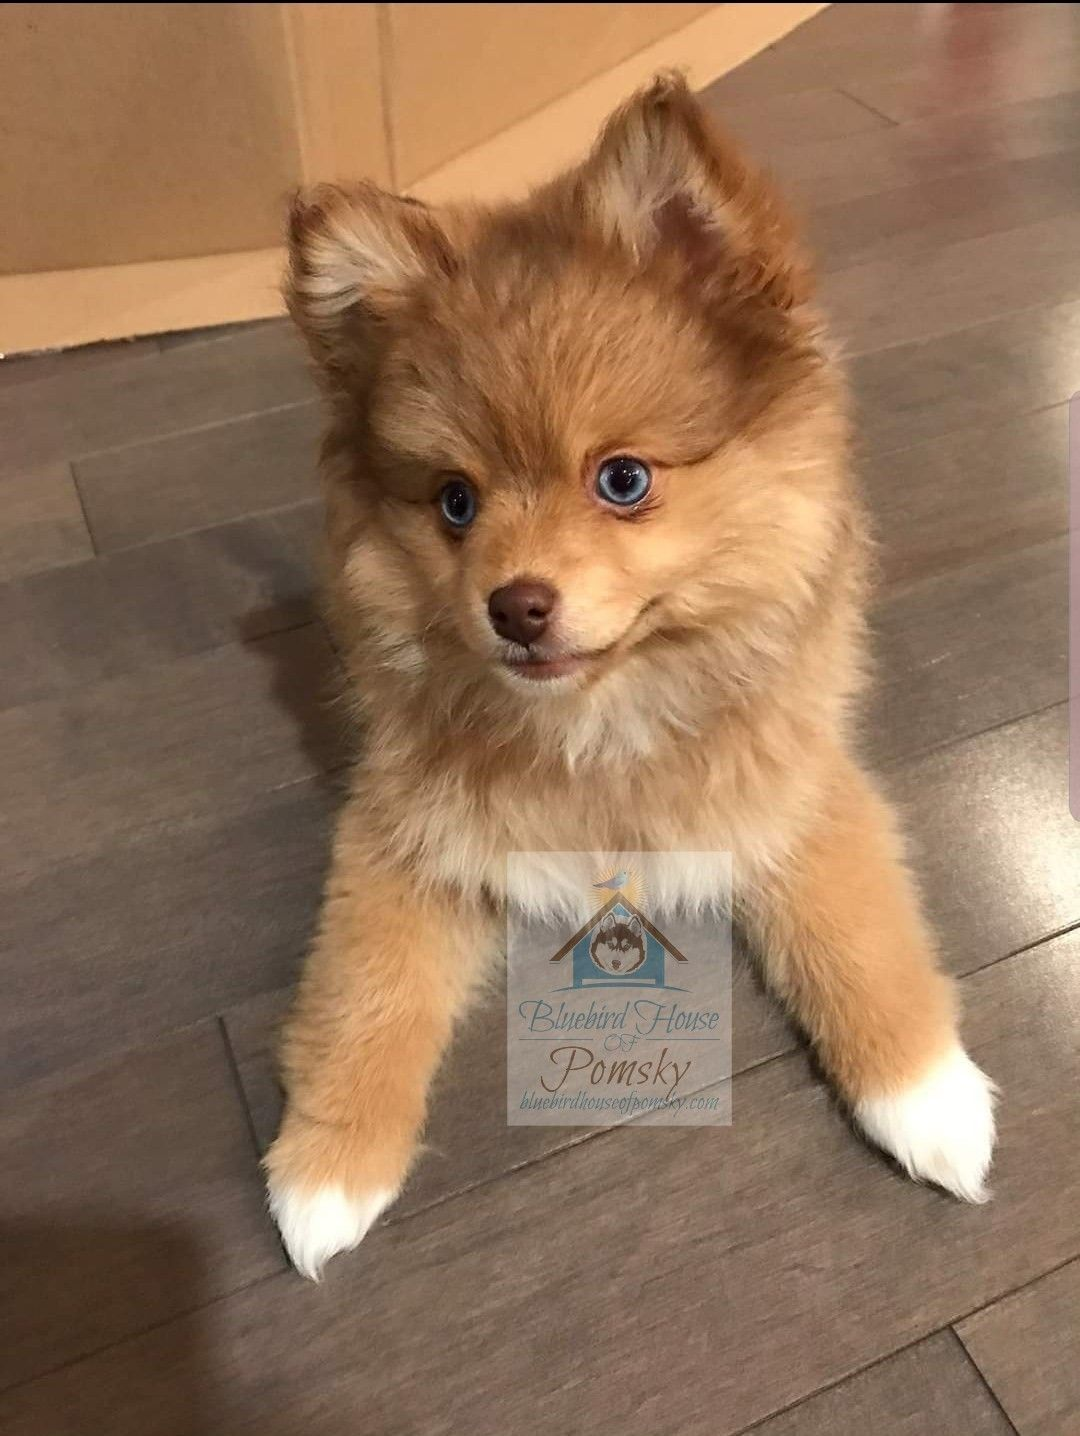 Pomeranian Breeders Mn : pomeranian, breeders, Chocolate, Sable, Pomsky, Puppy, @Bluebird, House, Puppies,, Puppies, Eyes,